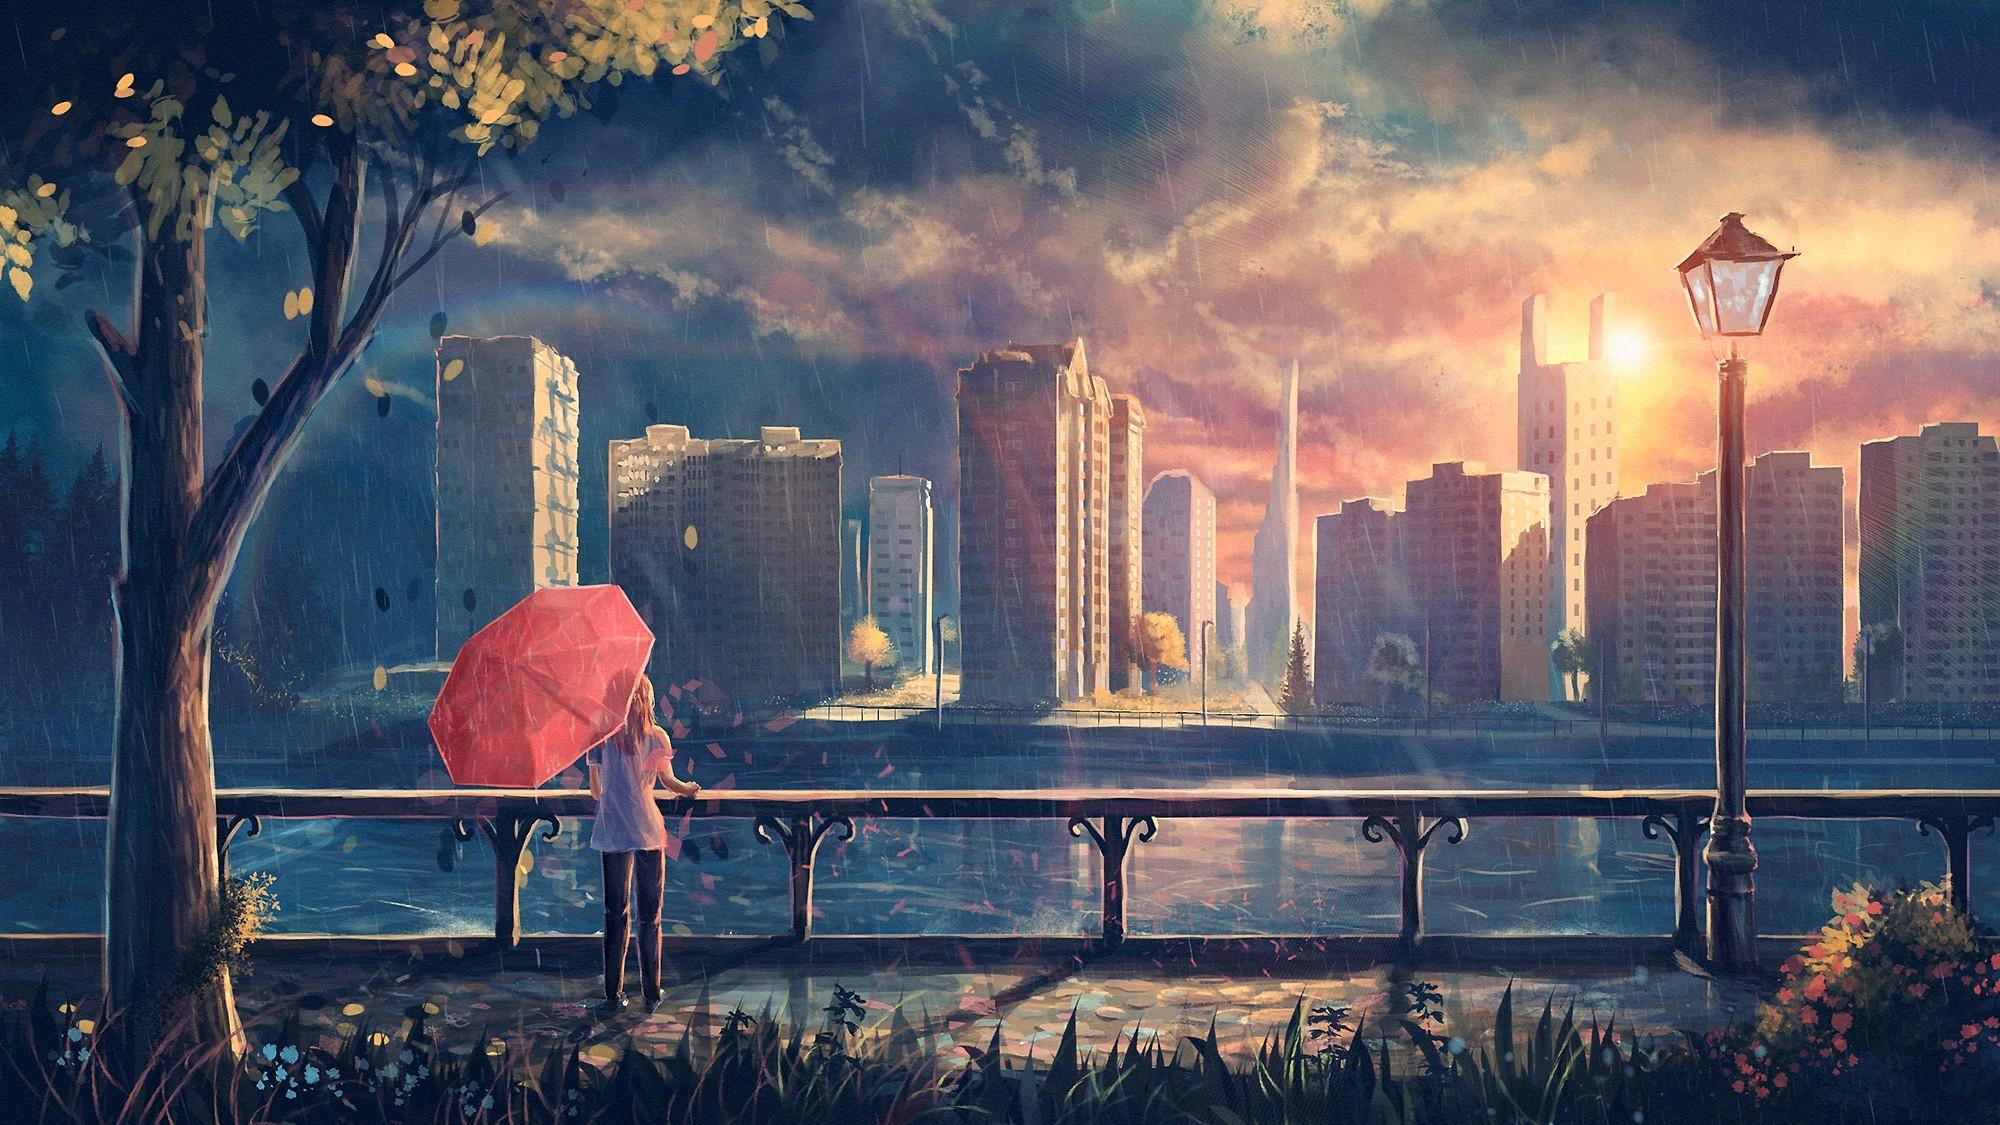 Artwork, Fantasy Art, Anime, Rain, City, Park, Umbrella - Anime Rainy City Background - HD Wallpaper